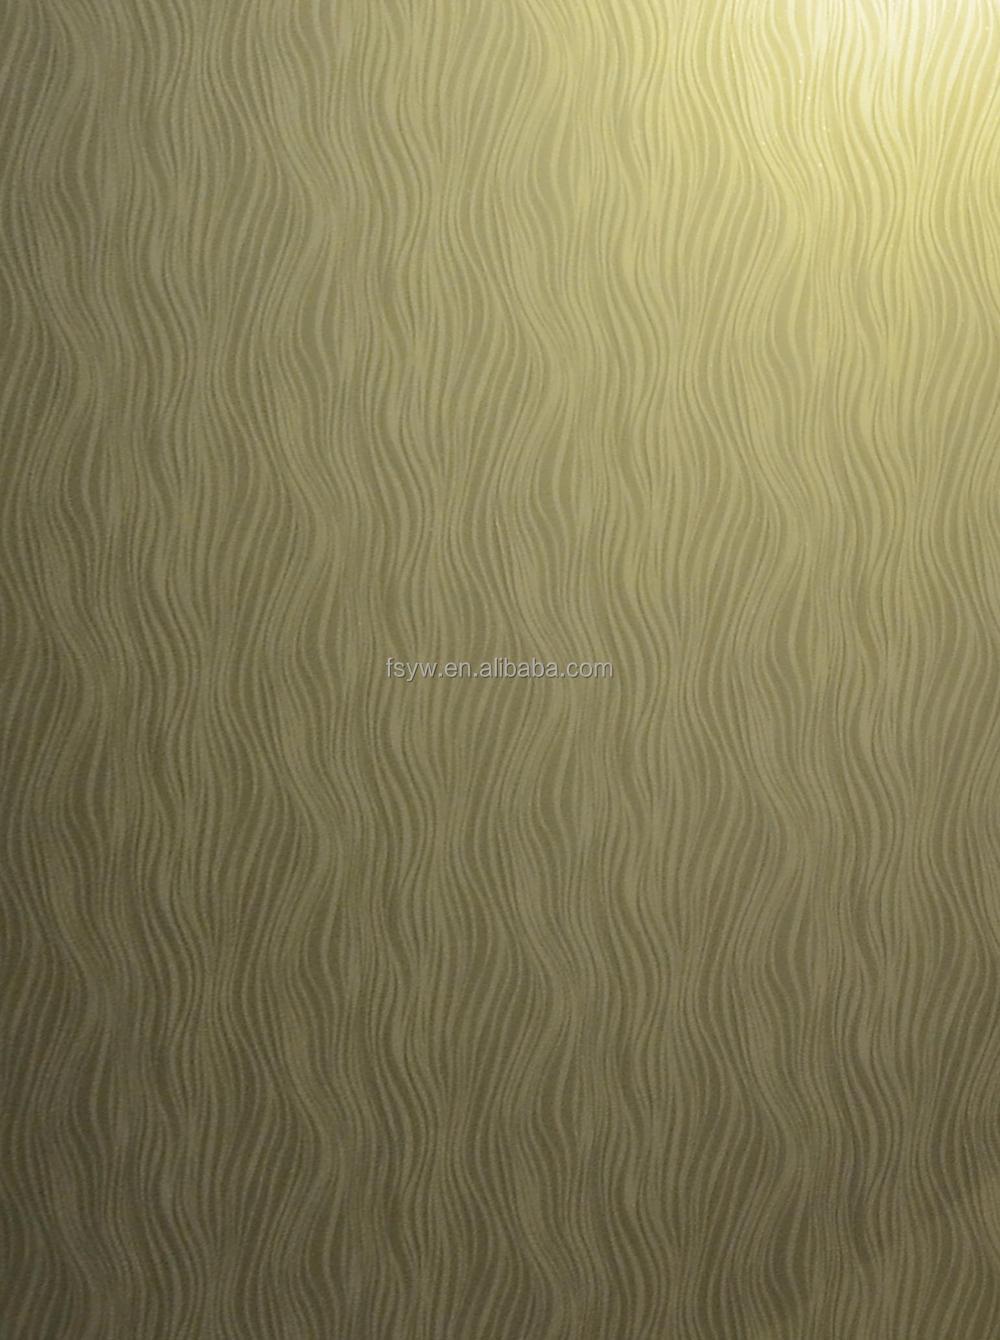 15mm acryl mdf wandpaneel dekorativen küche wandplatten holz ...